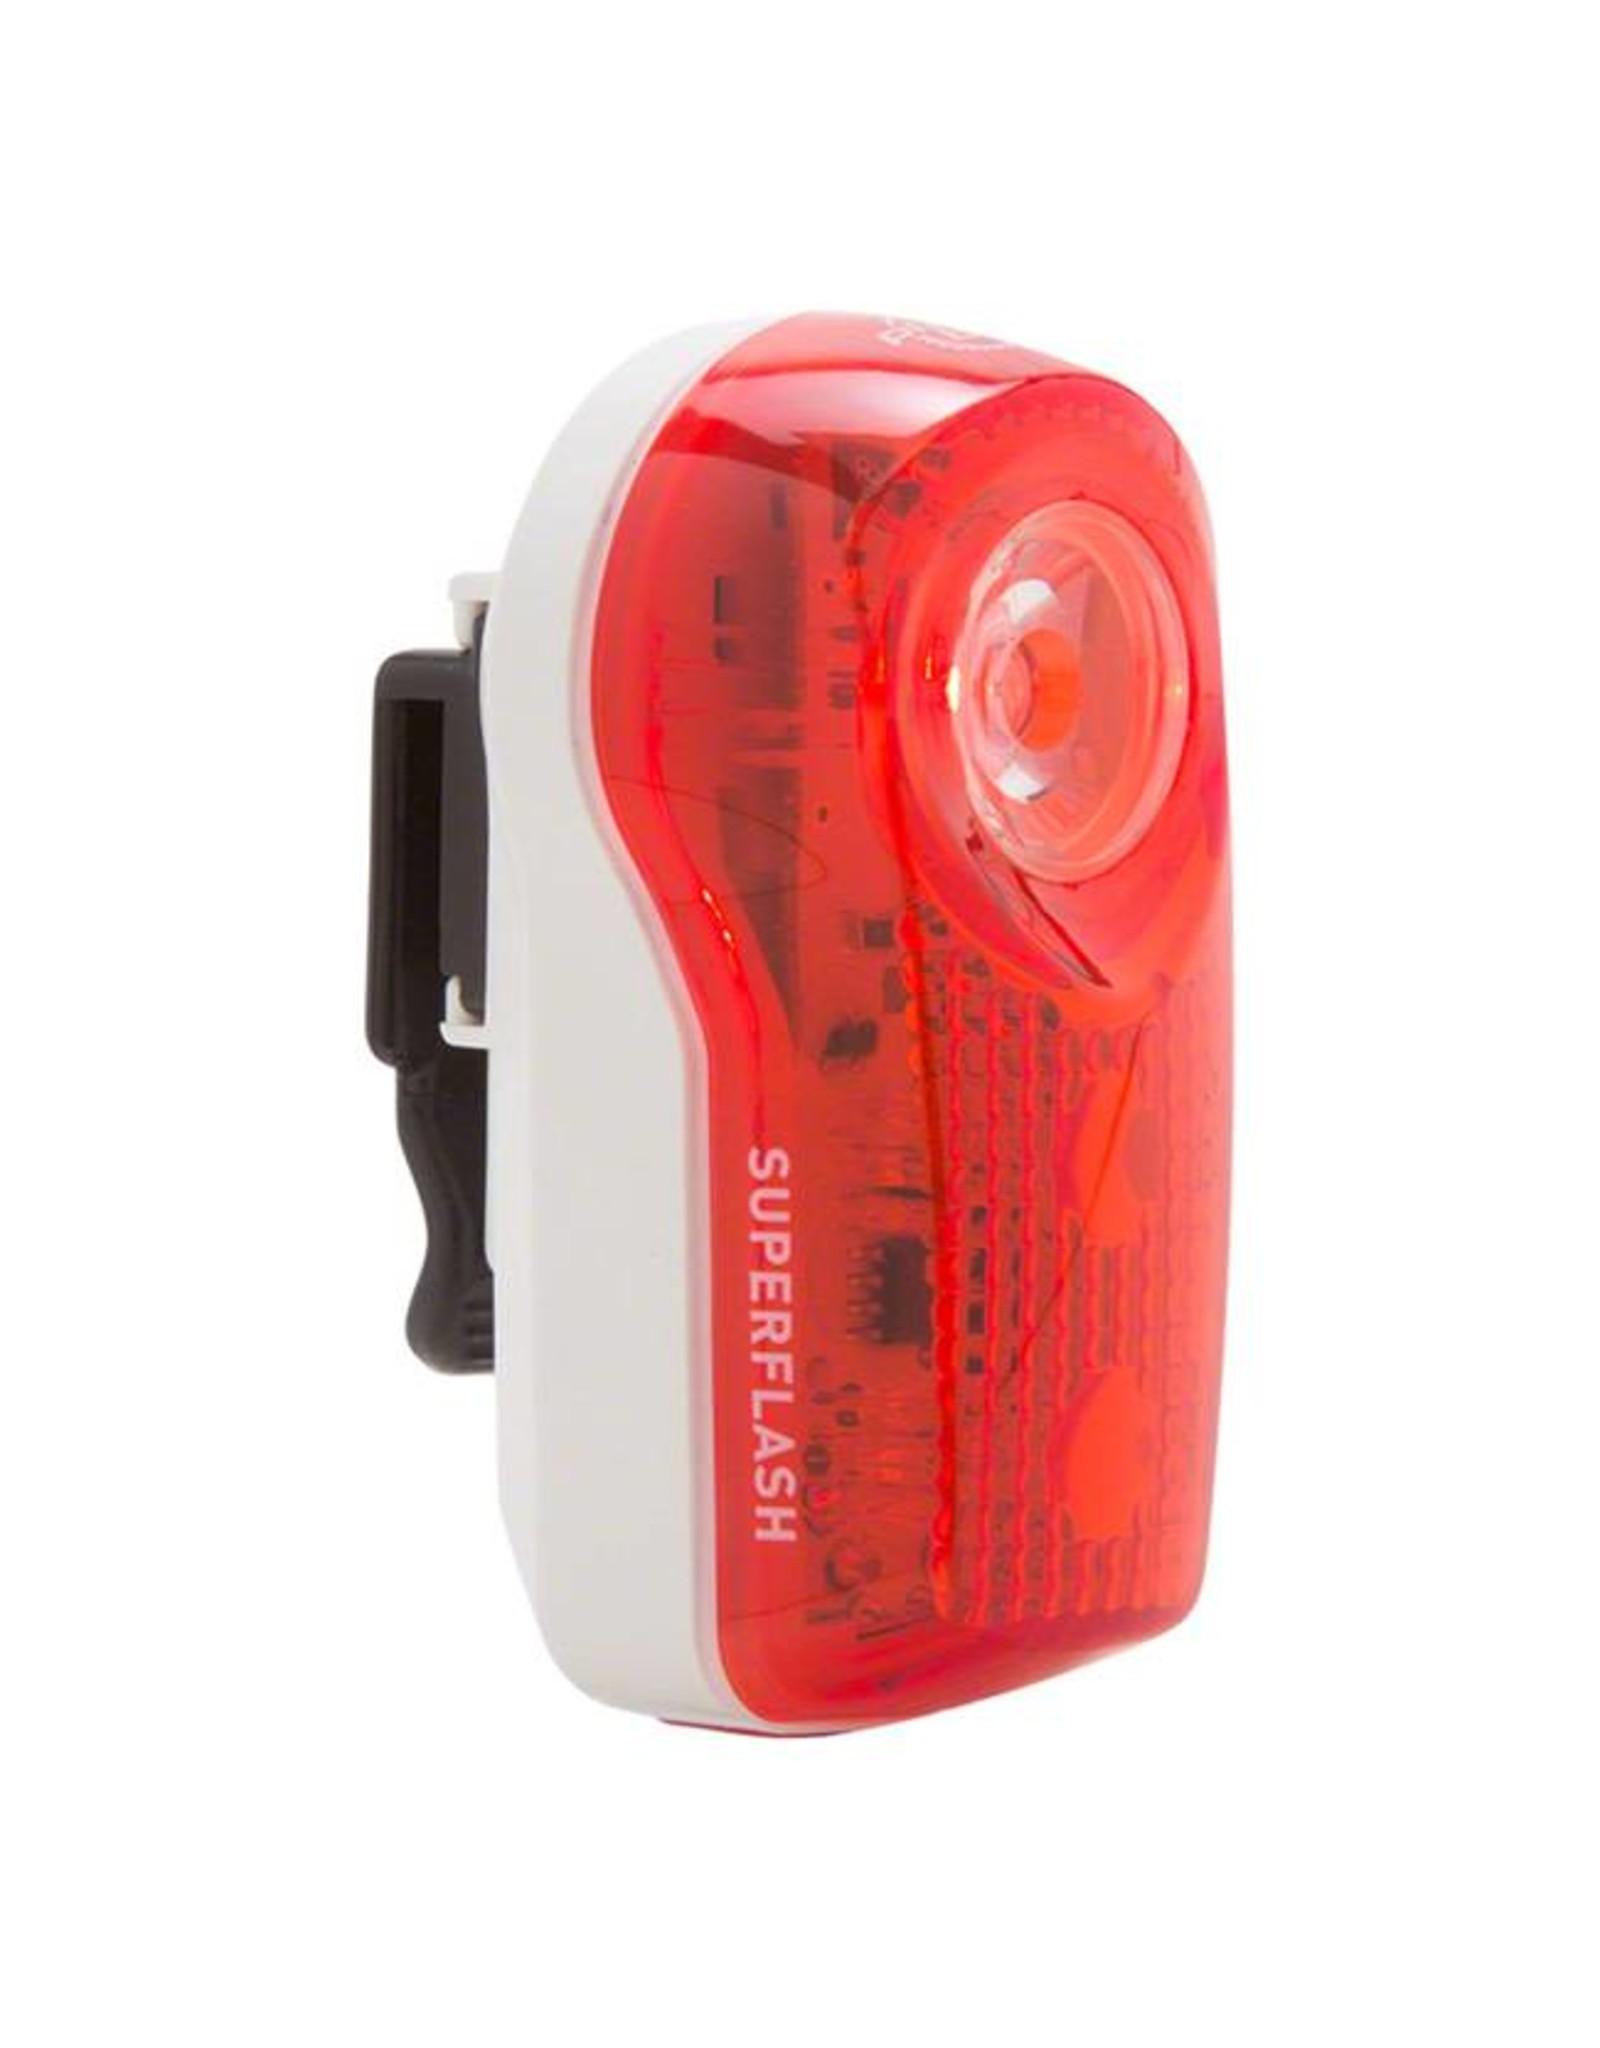 Planet Bike Planet Bike LED Superflash Taillight: Red/White